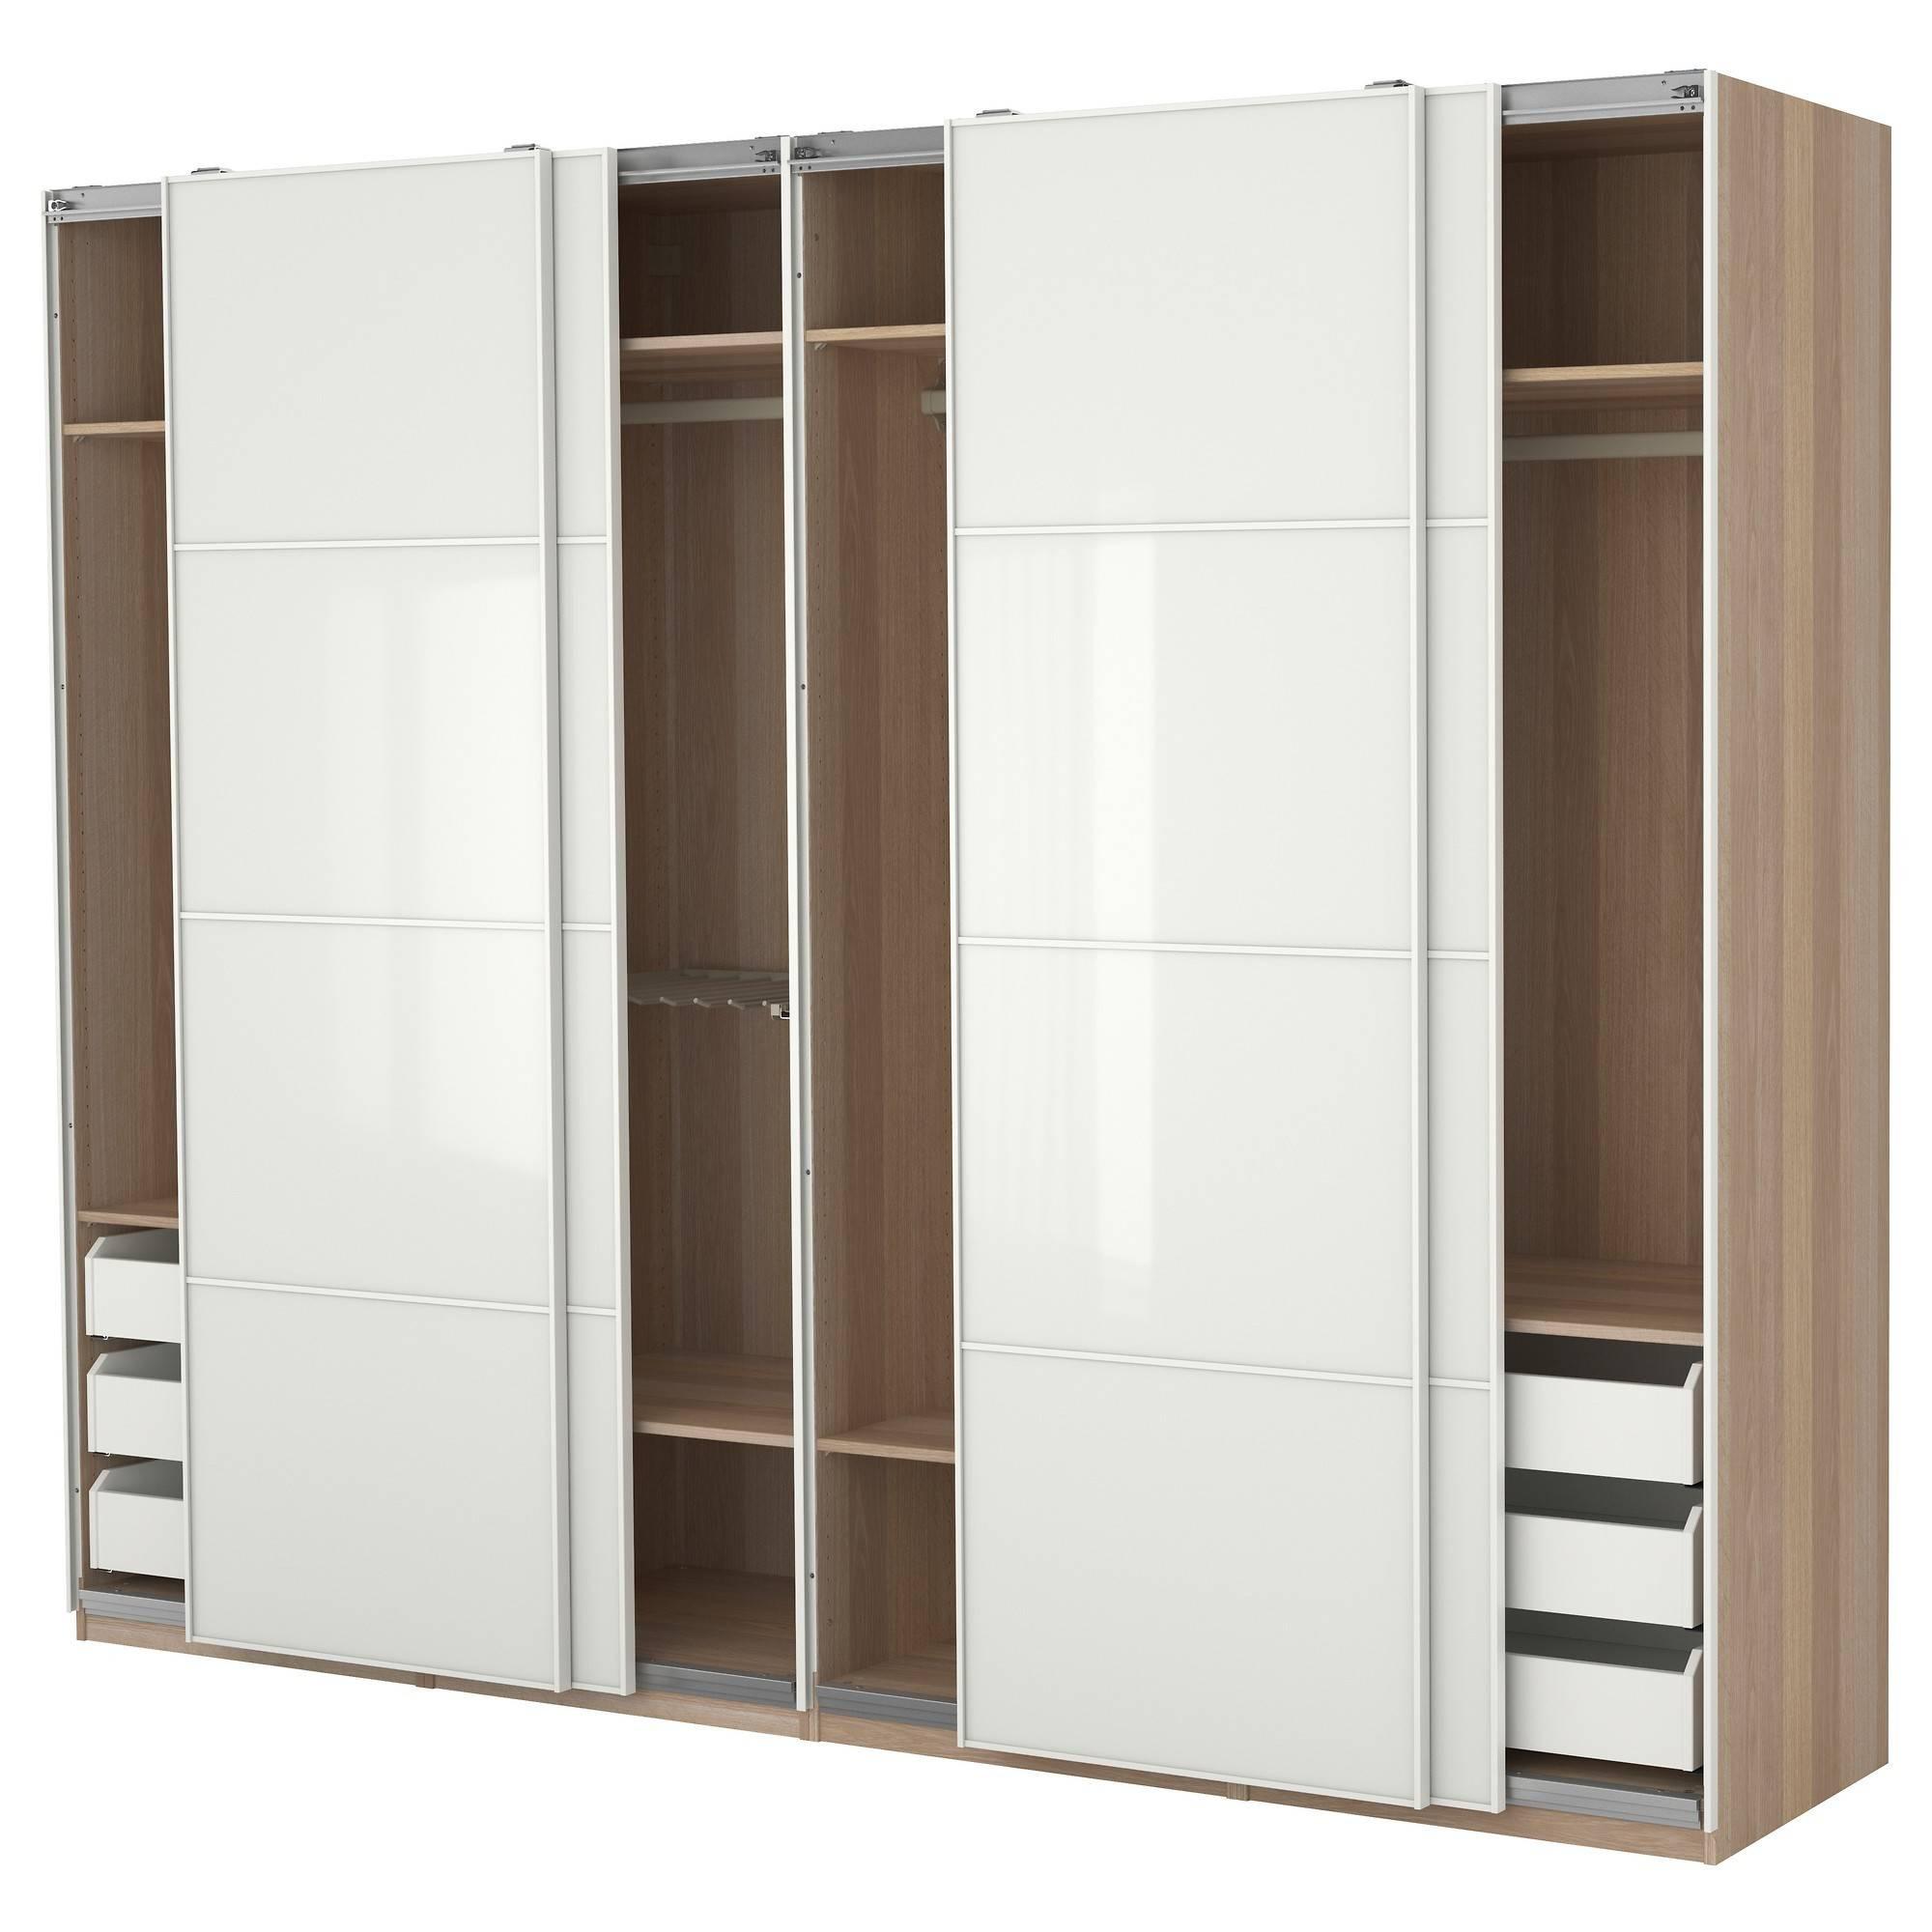 Cheap Closet Doors – Karinnelegault With Regard To Cheap 4 Door Wardrobes (View 3 of 15)